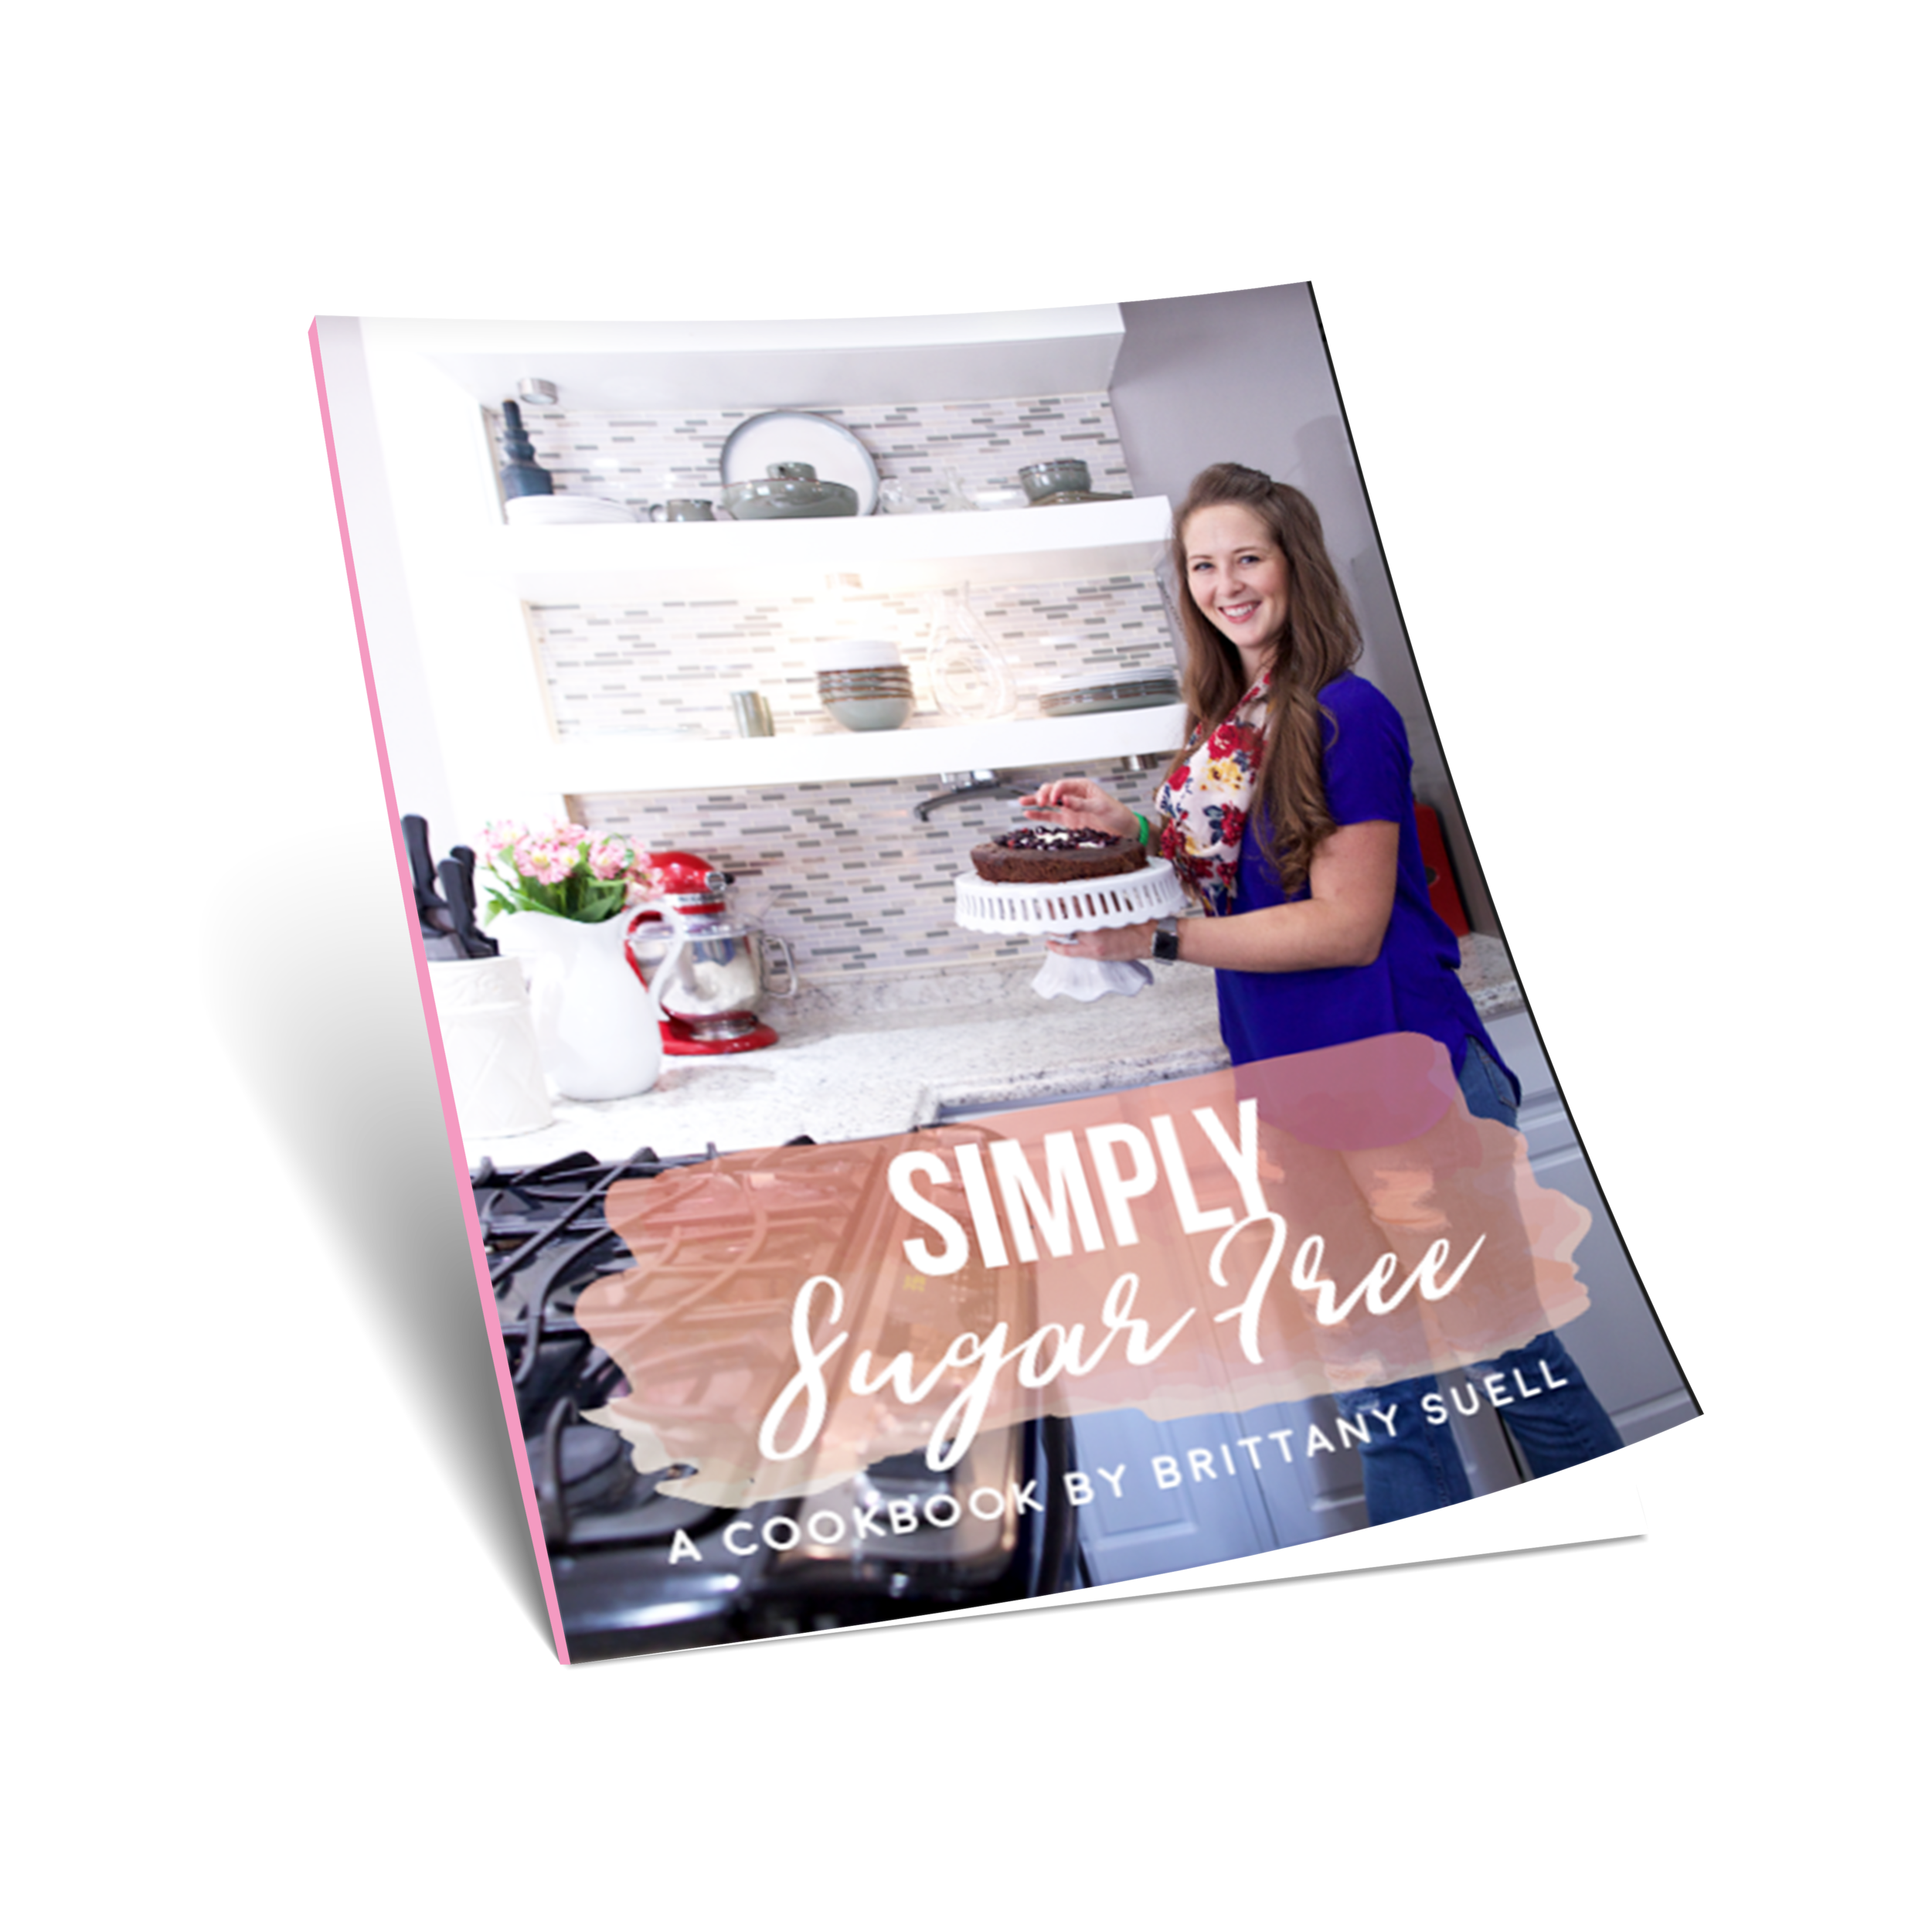 - Simply Sugar Free Cookbook